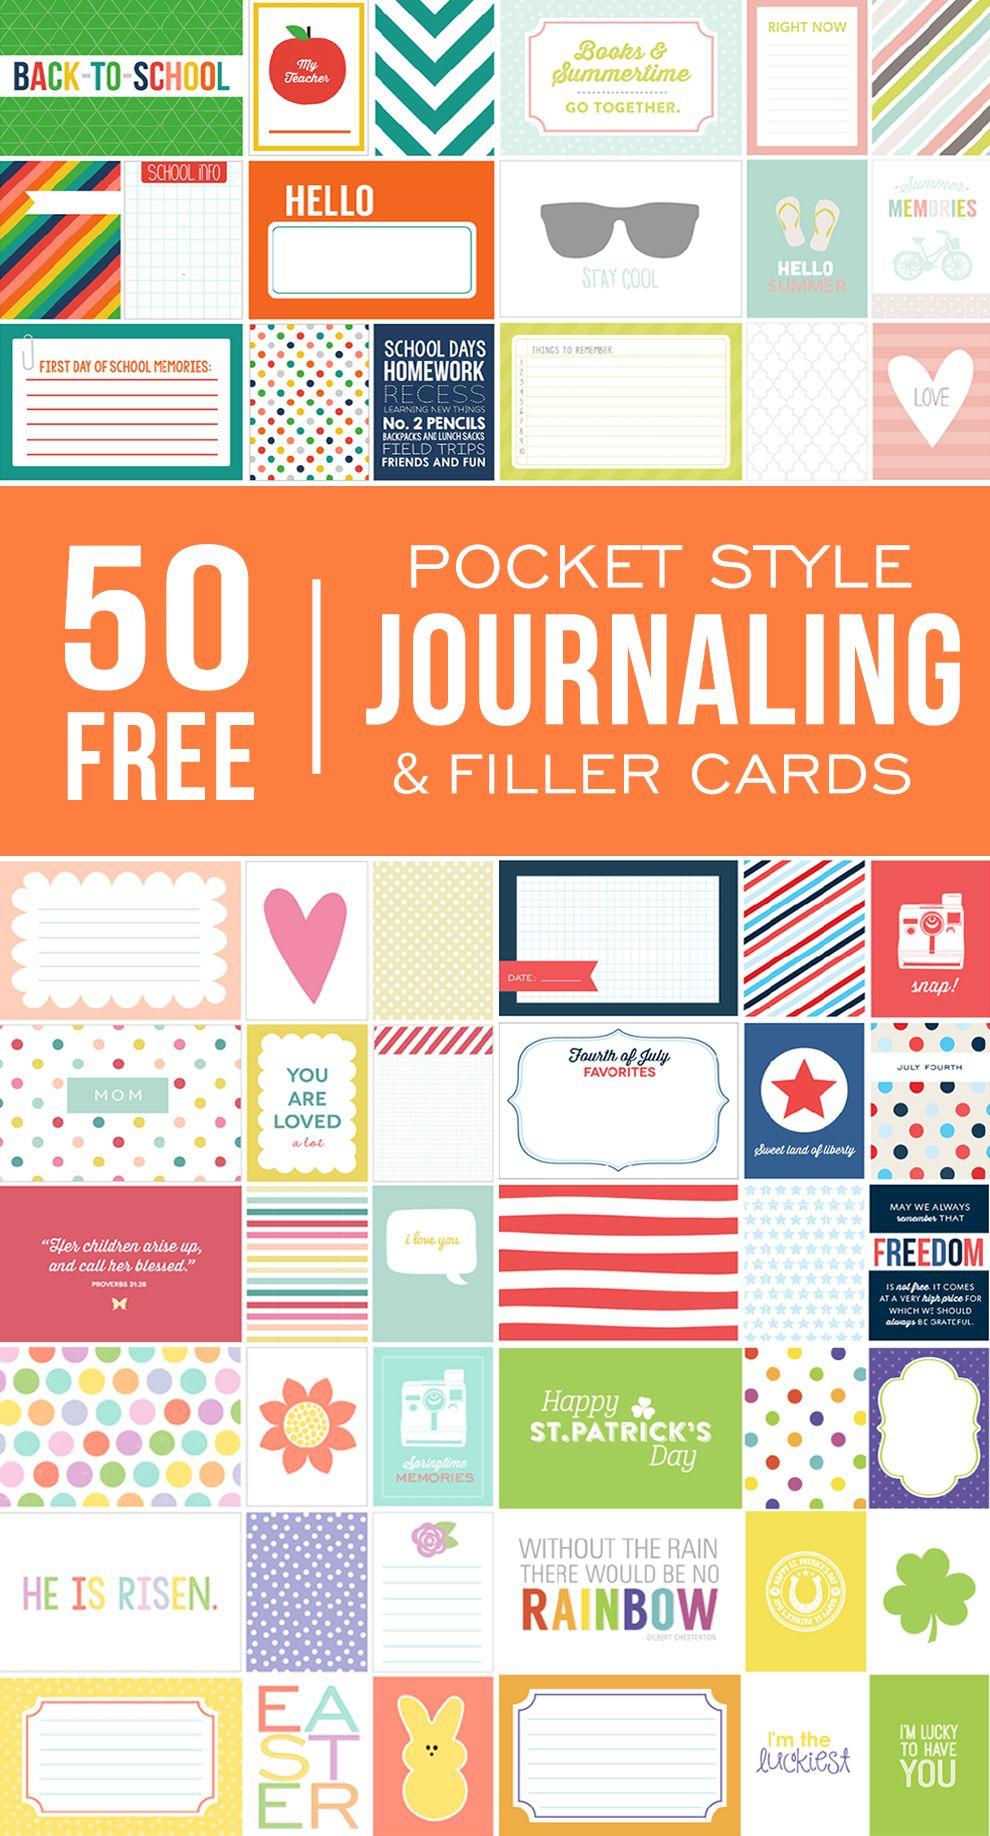 Scrapbook journaling ideas free - Ultimate Roundup Of Free Journaling Filler Card Printables